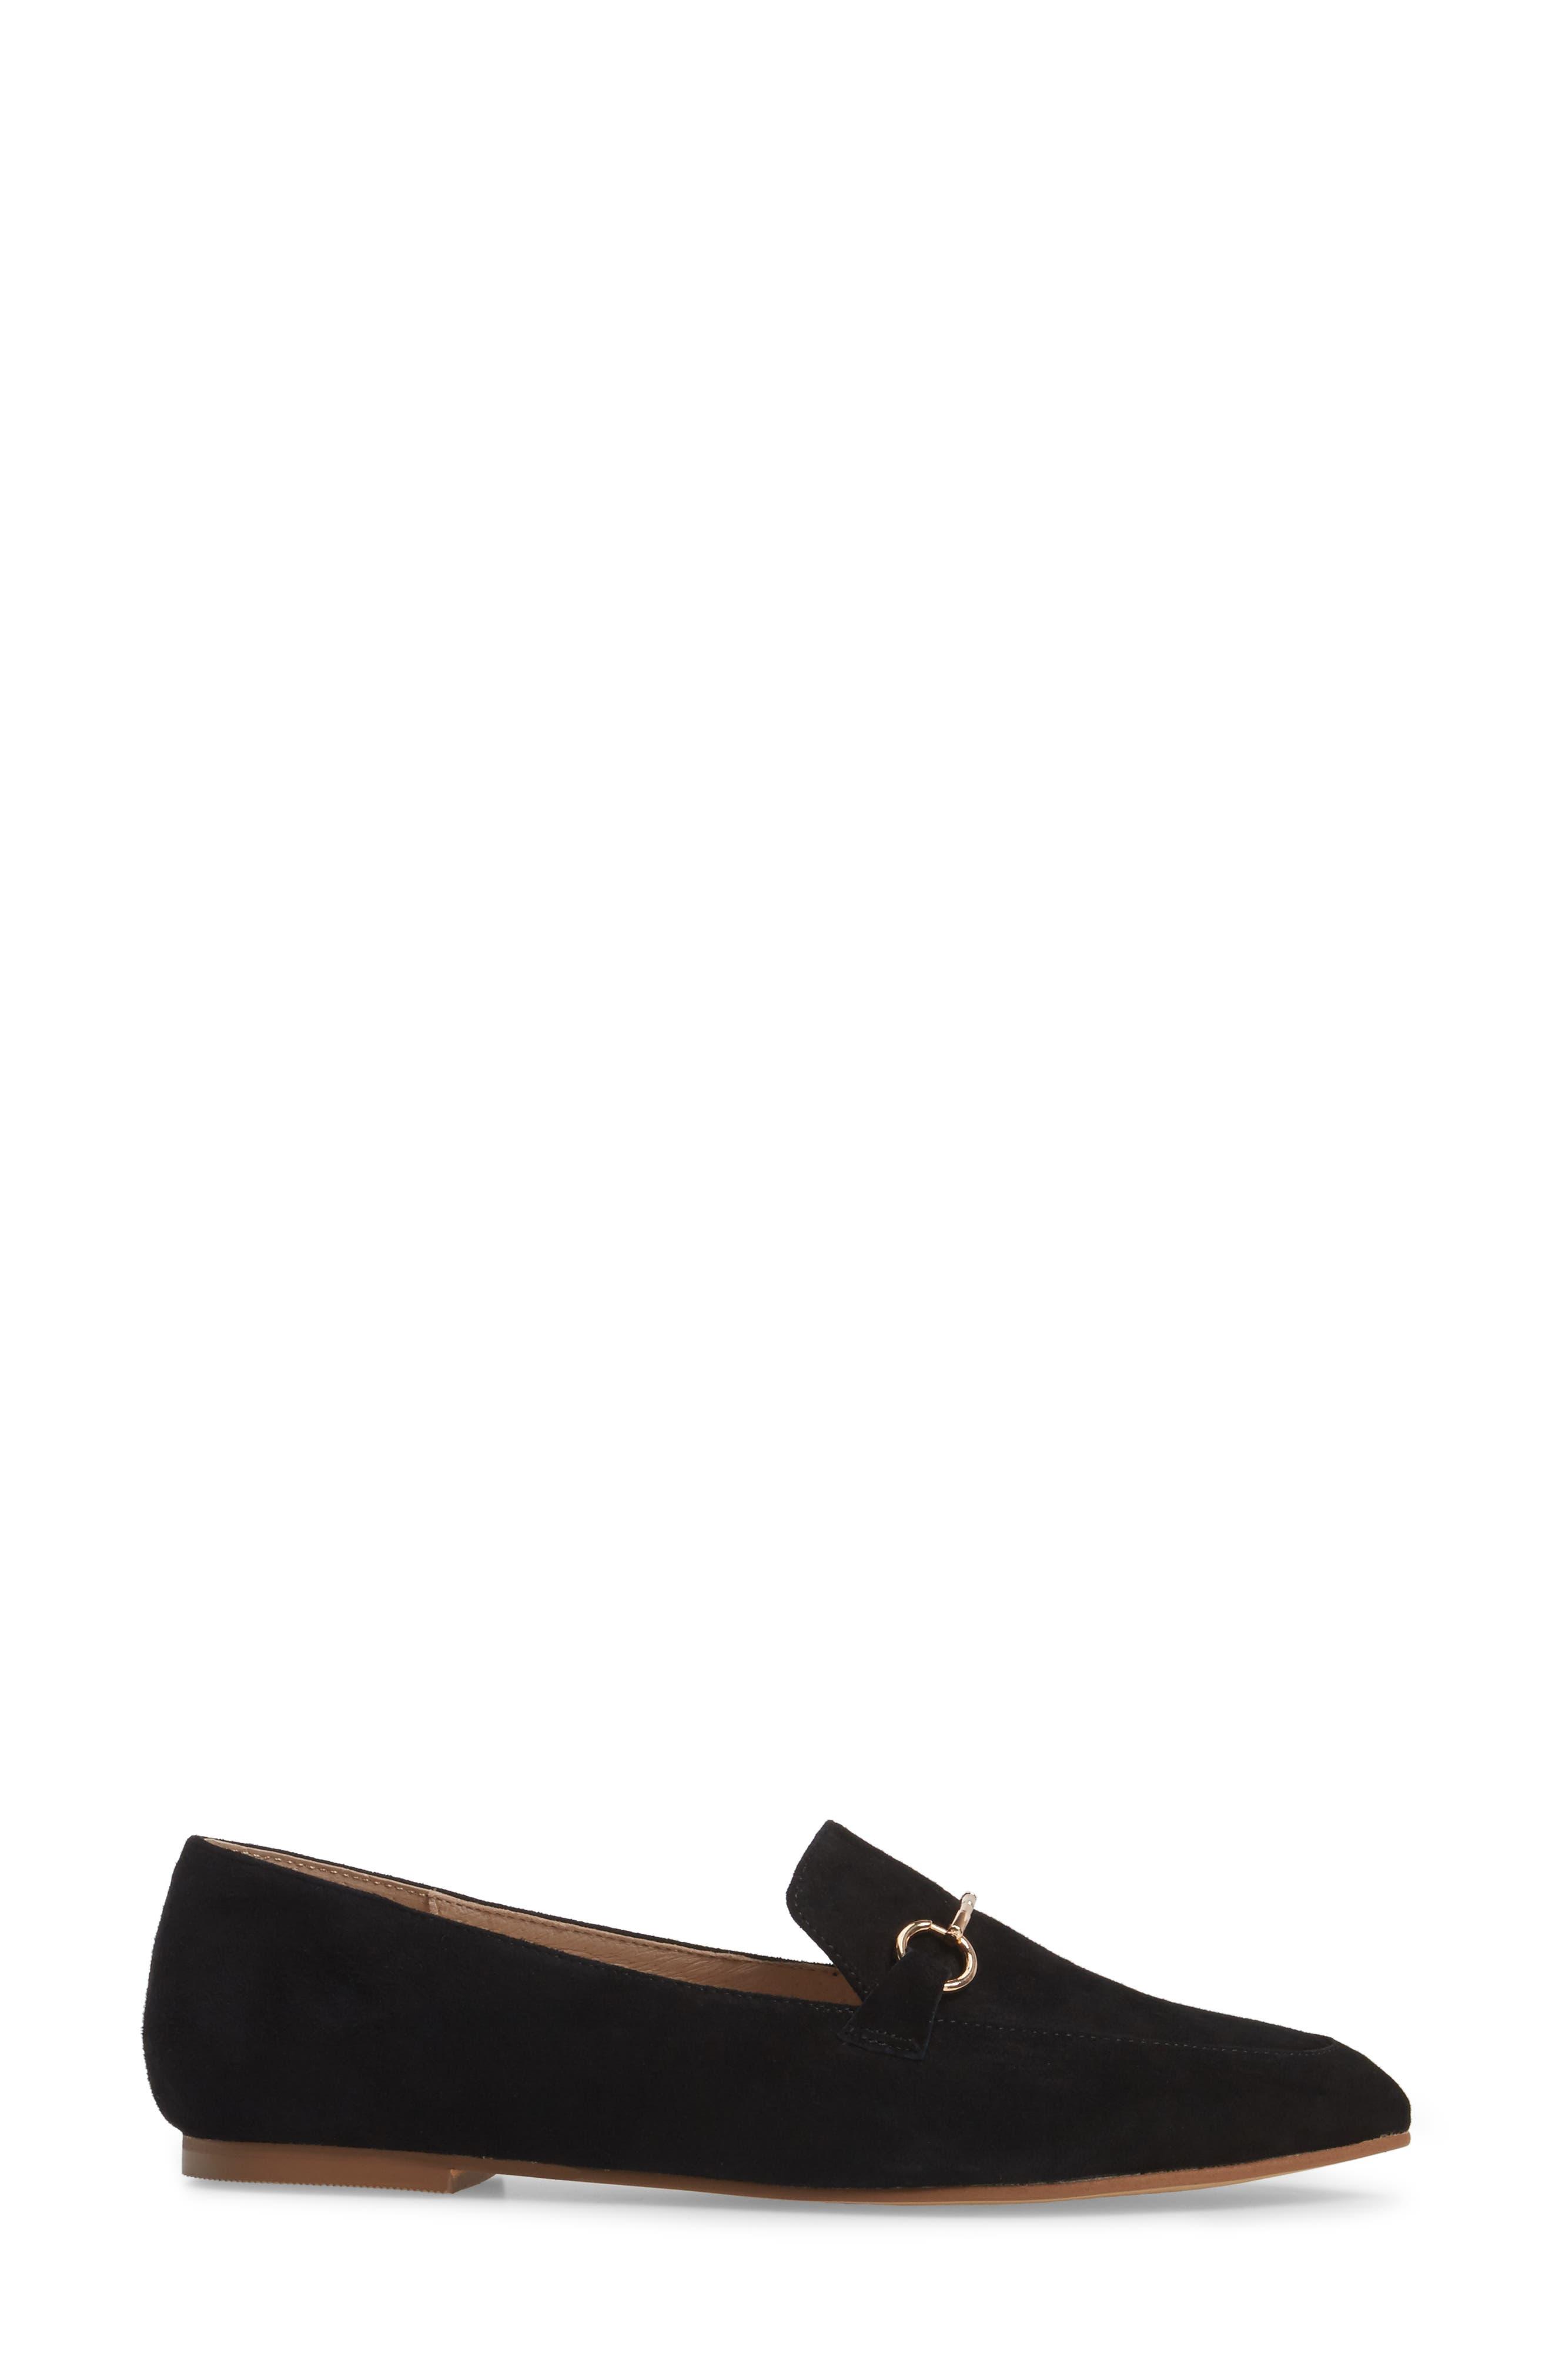 Alternate Image 3  - Kristin Cavallari Cambrie Loafer Flat (Women)